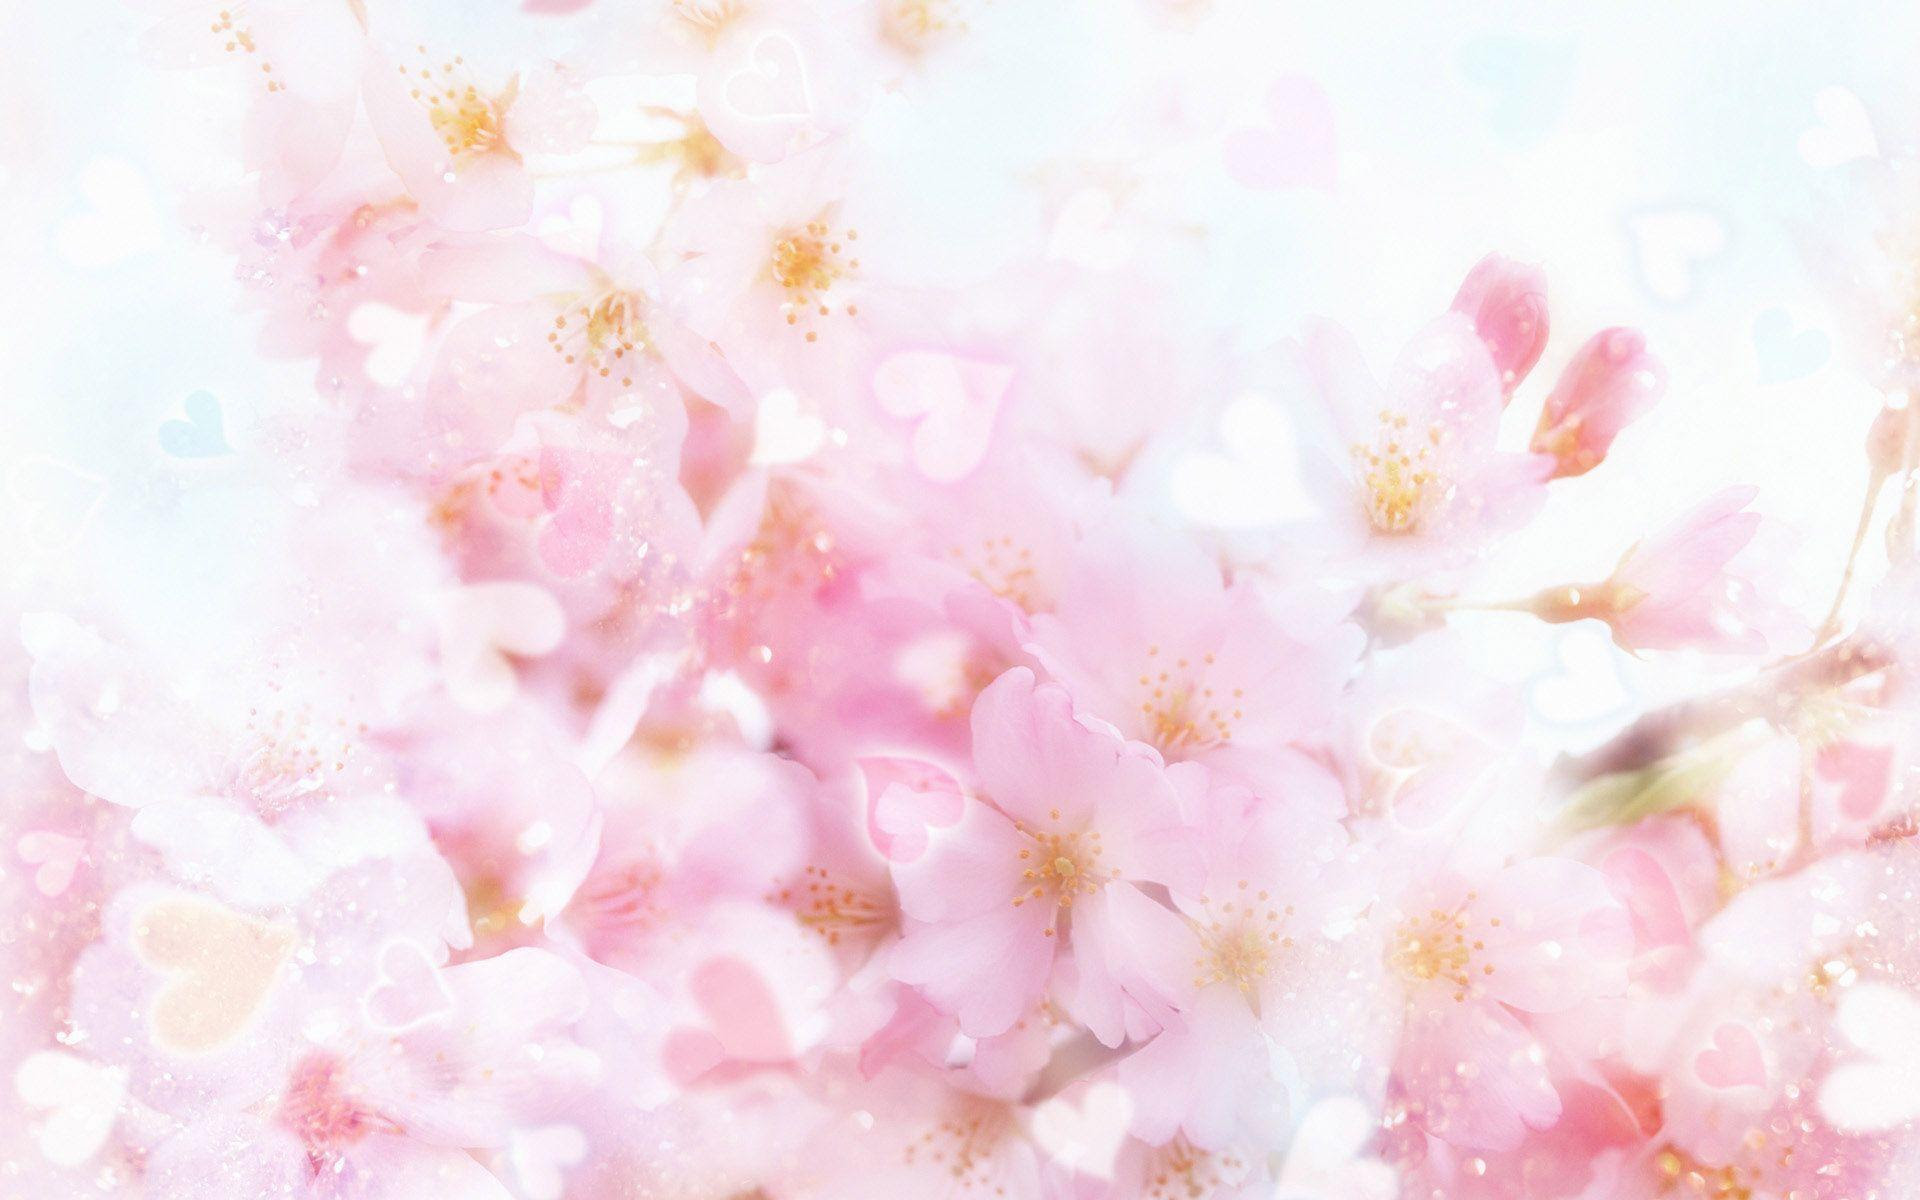 Pink Flower Wallpaper Backgrounds - Wallpaper Cave